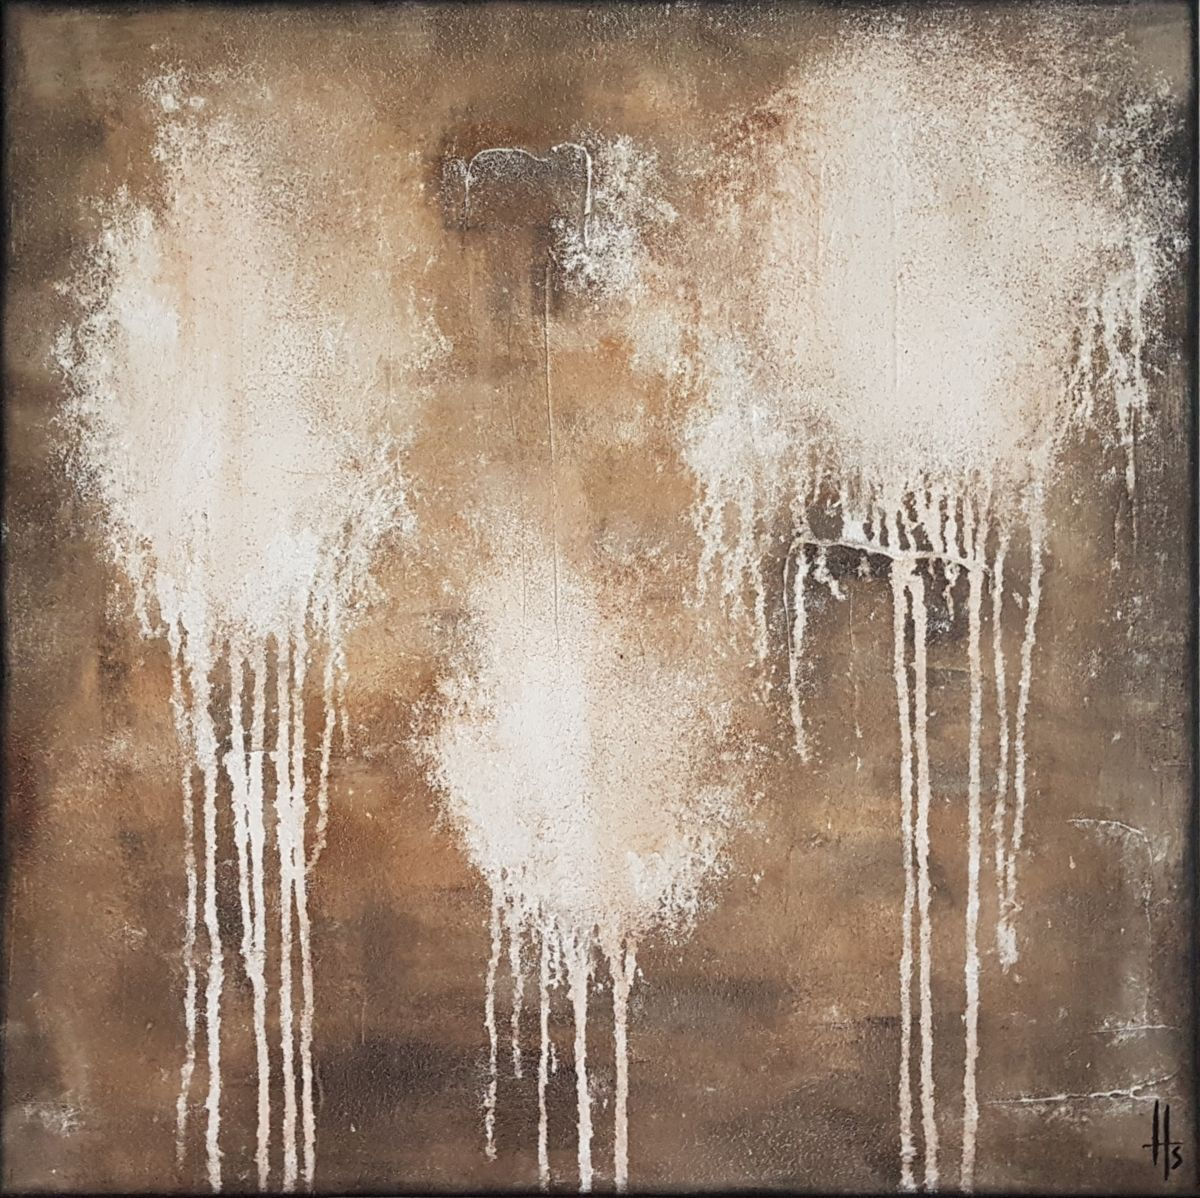 tableau peinture abstrait style industriel